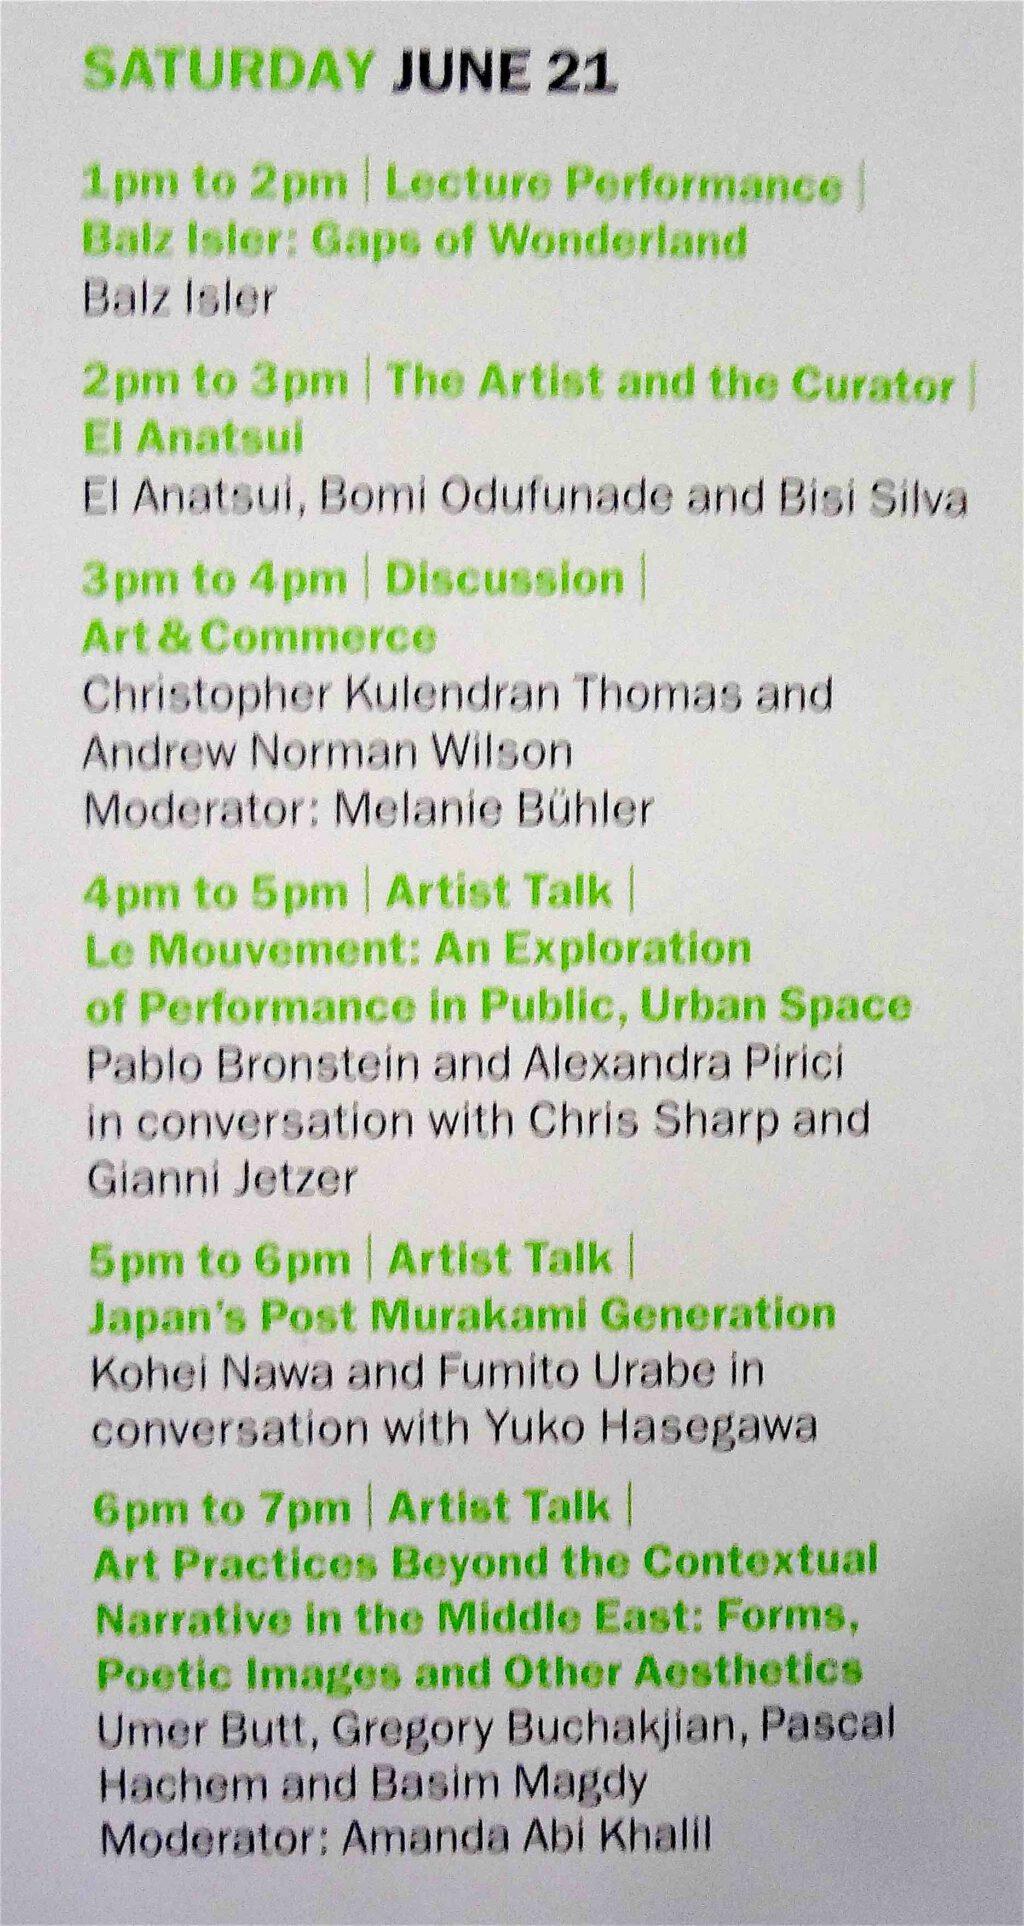 Art Basel Salon program on 2014-6-21, 17-18 Talk on Post Murakami